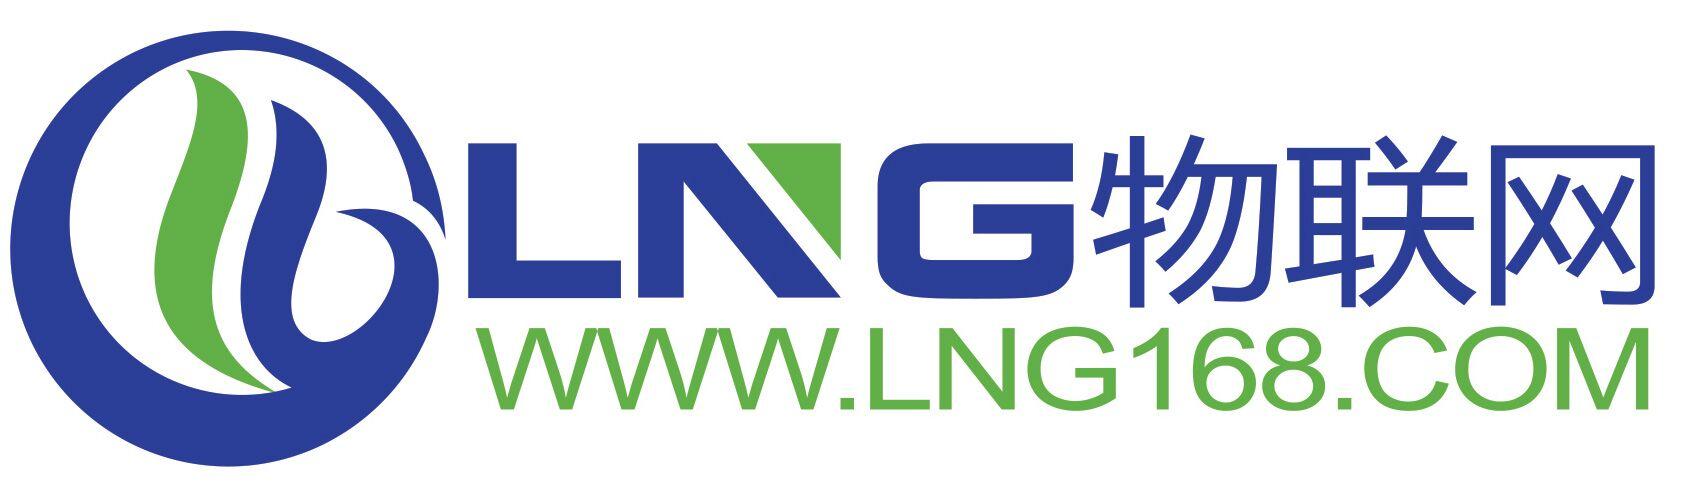 名称:LNG物联网 描述: